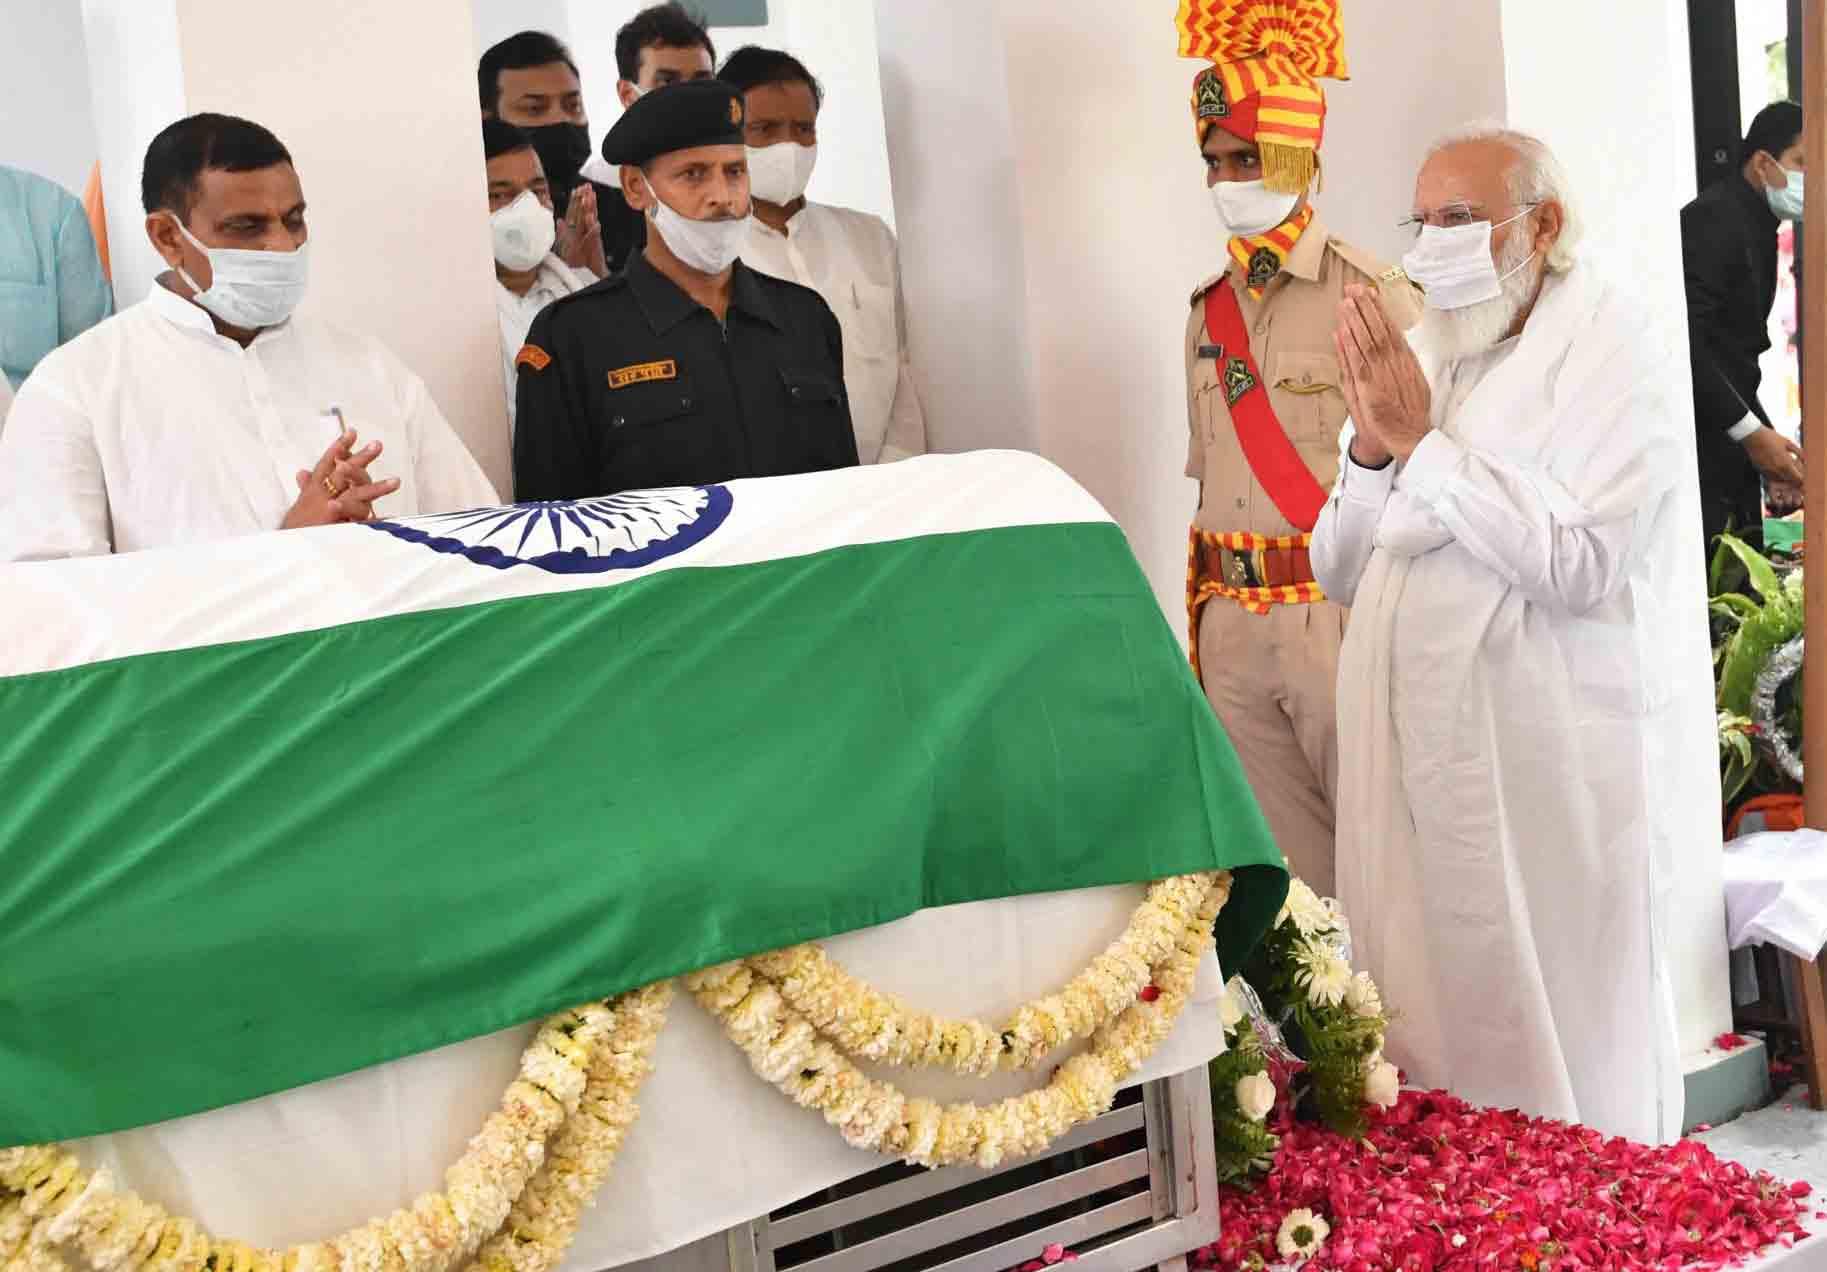 Kalyan Singh Ji…A Leader Who Always Worked For Jan Kalyan And People Will Always Admire Him Across India: PM Modi